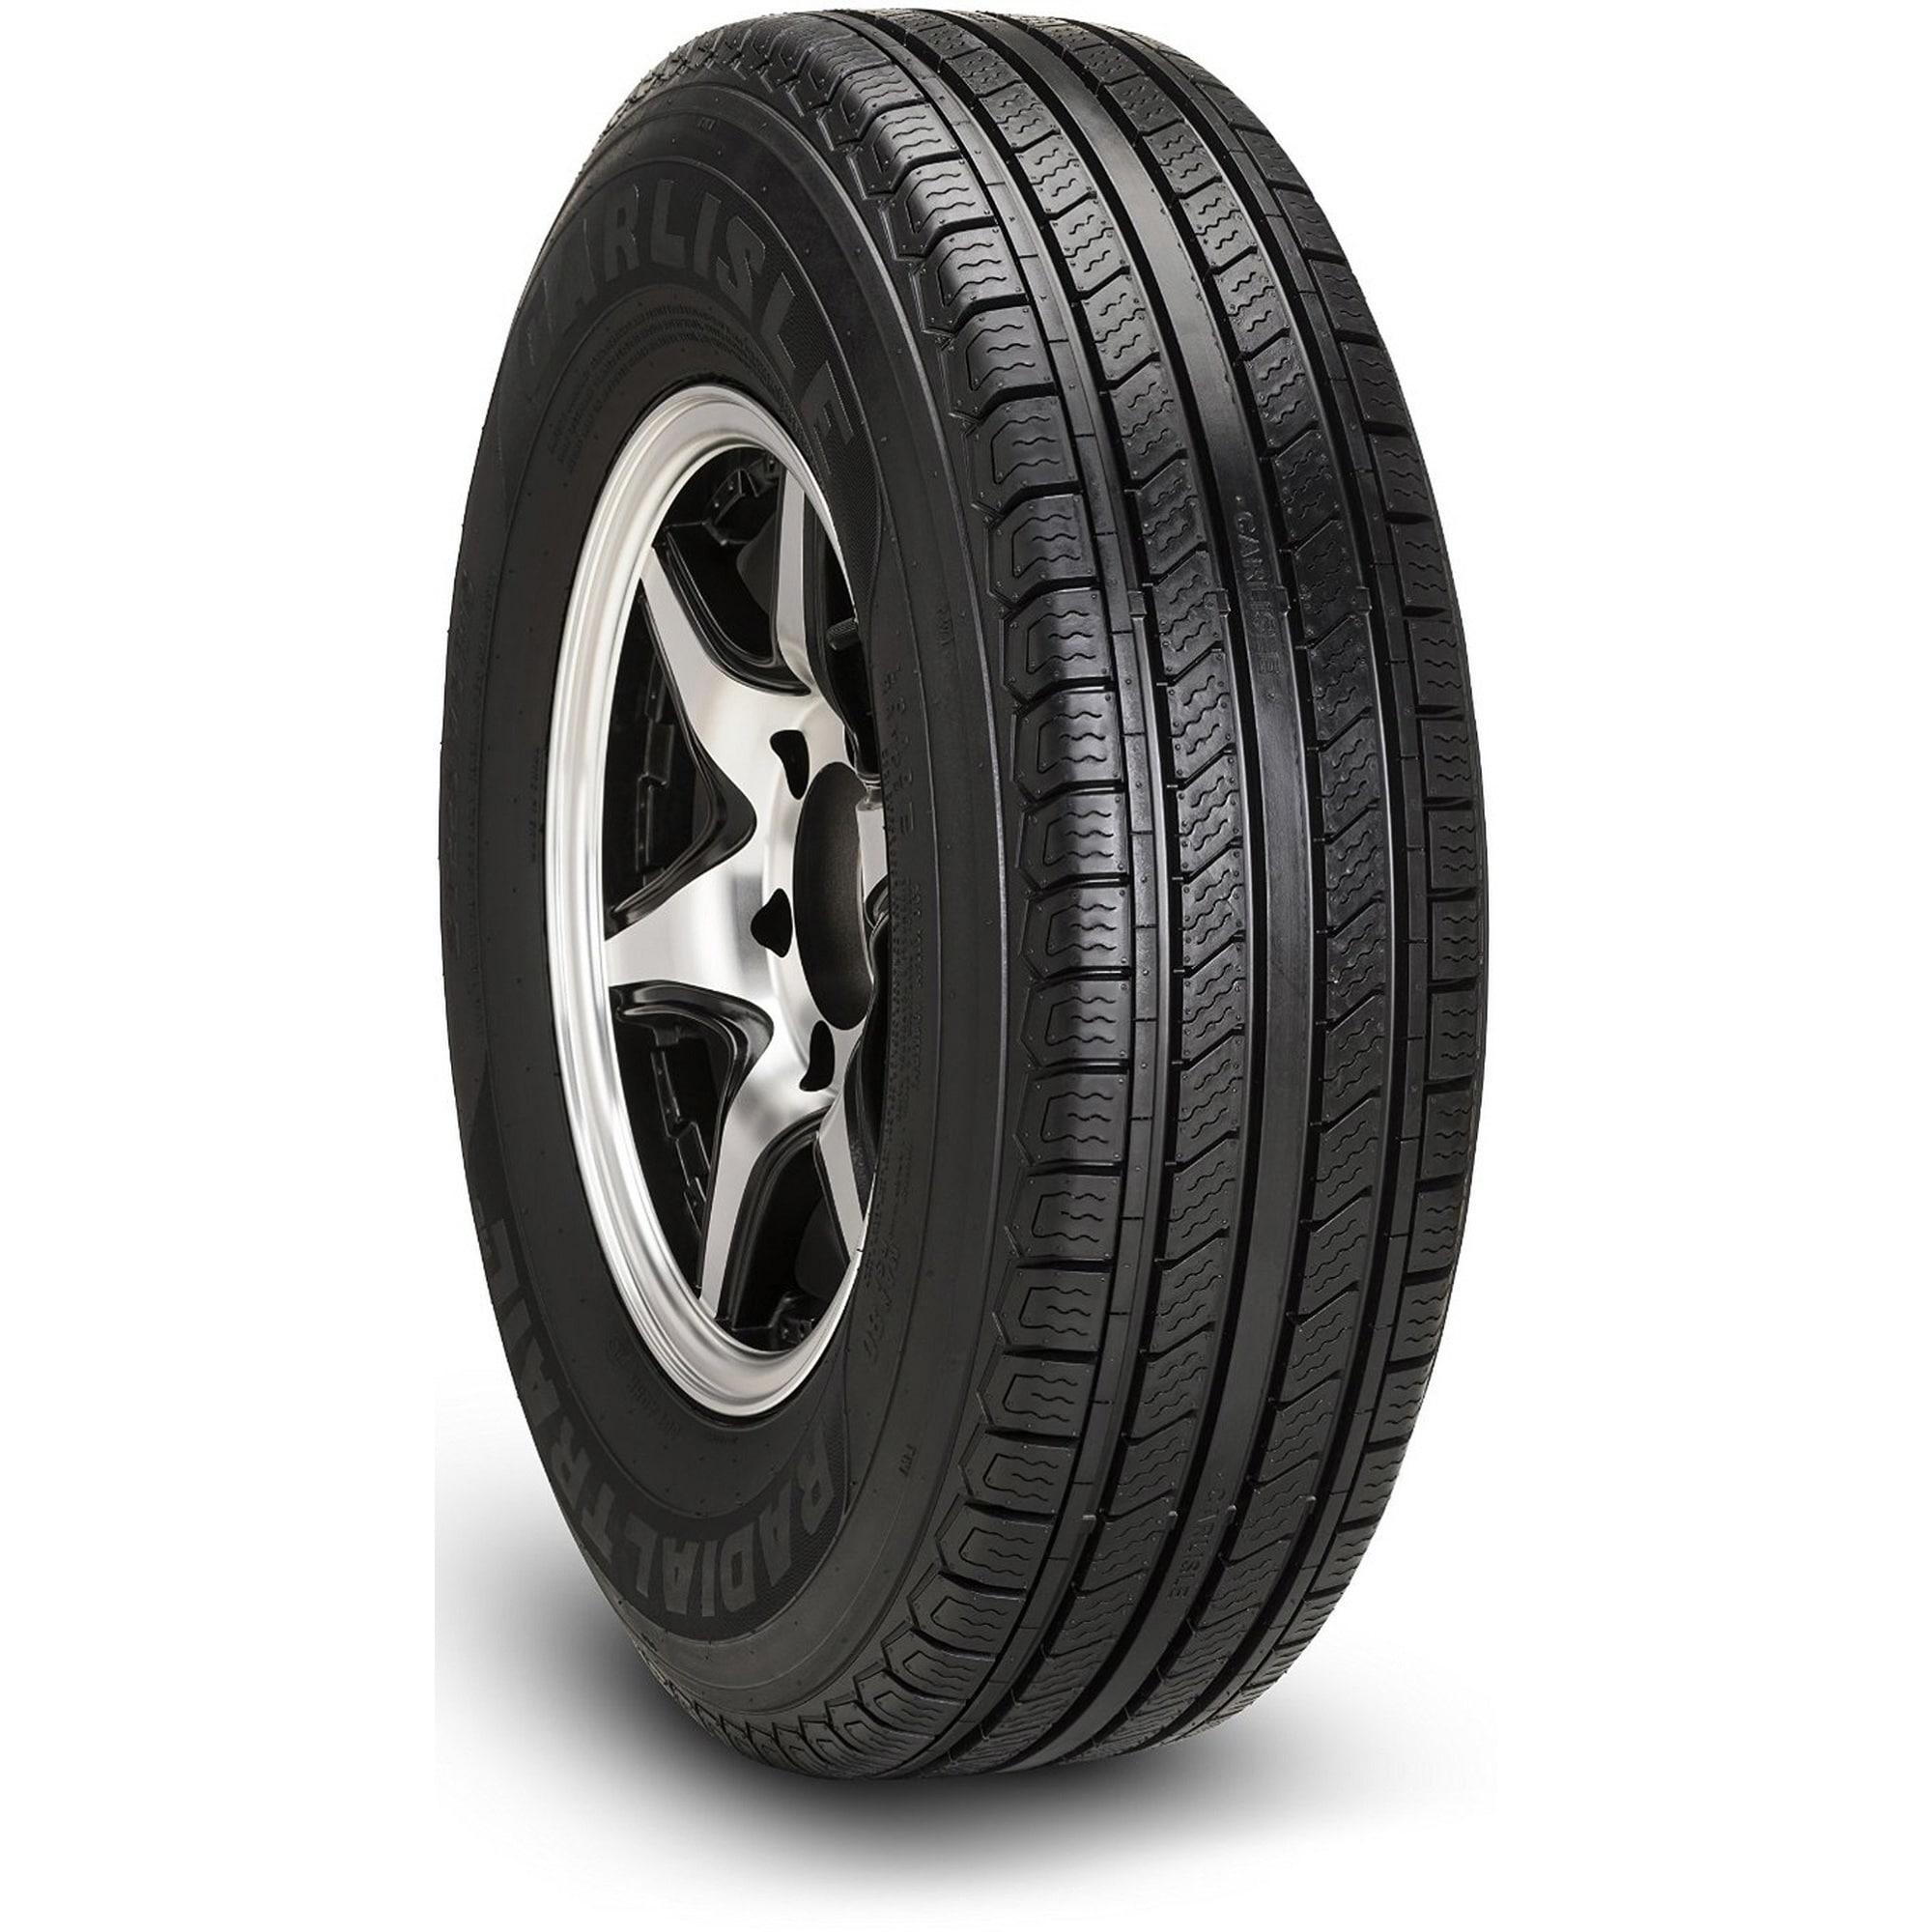 Carlisle Radial Trail HD Trailer Tire - ST225/75R15 LRE/1...